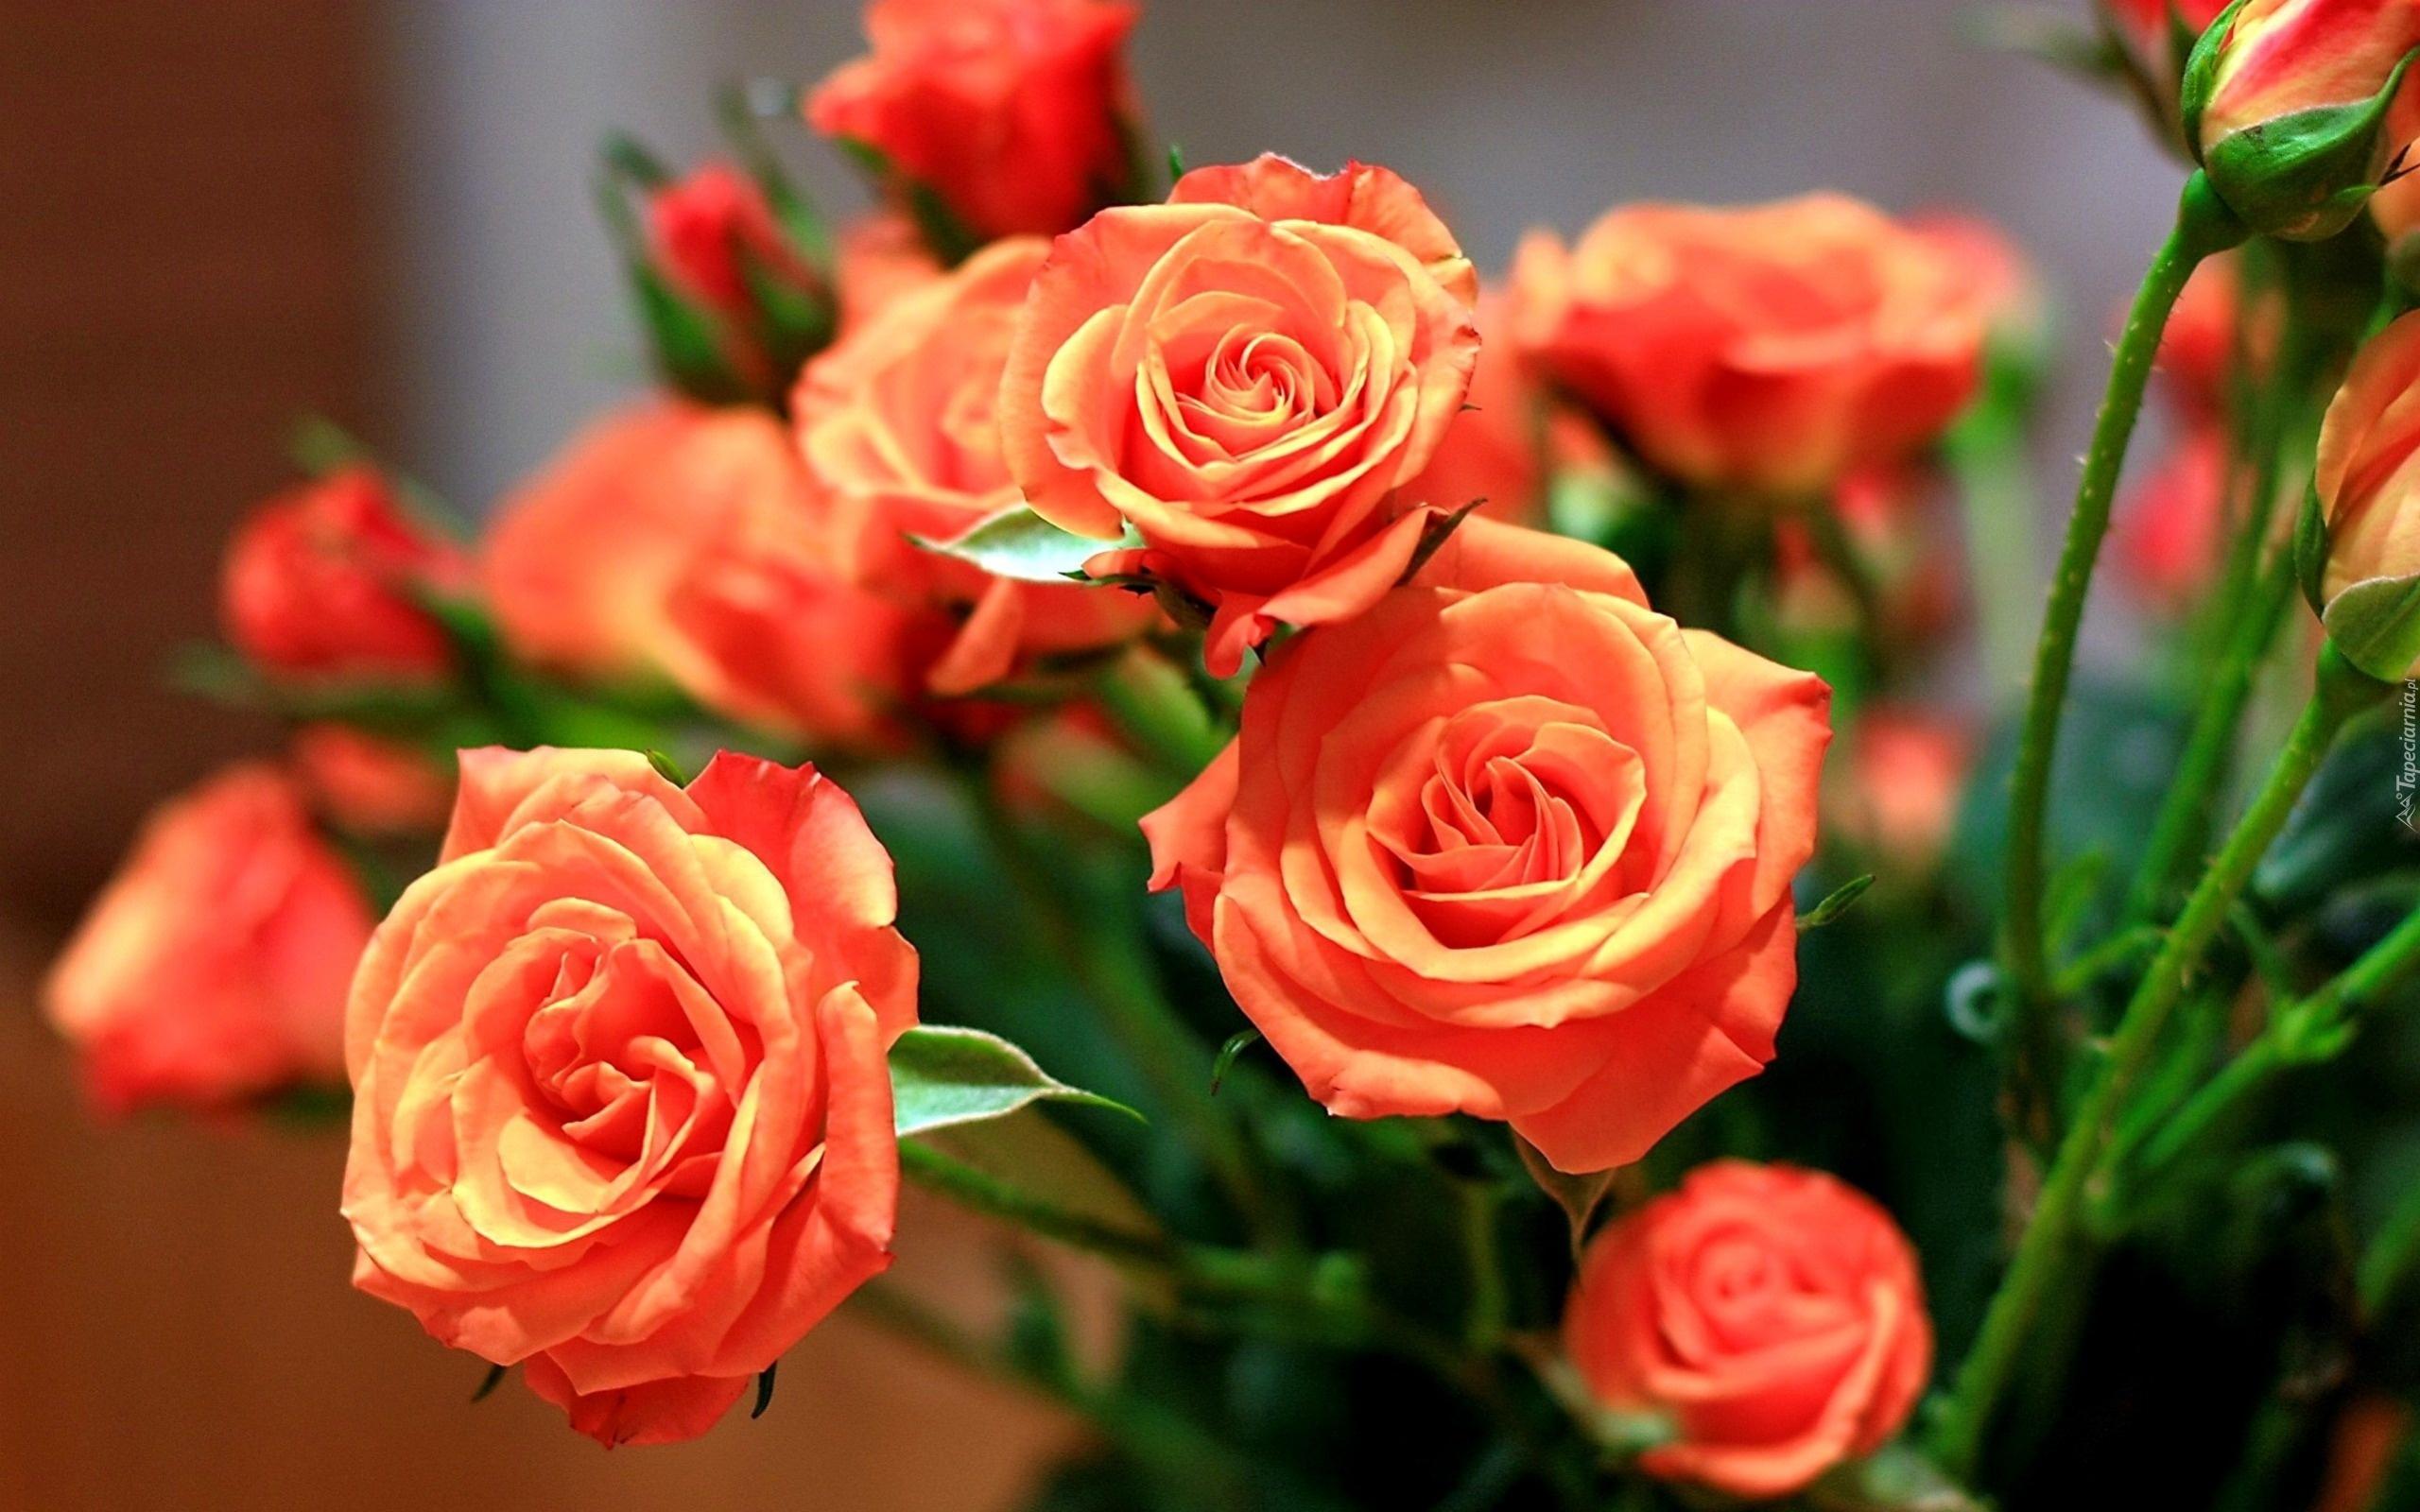 Цветы красавице картинки